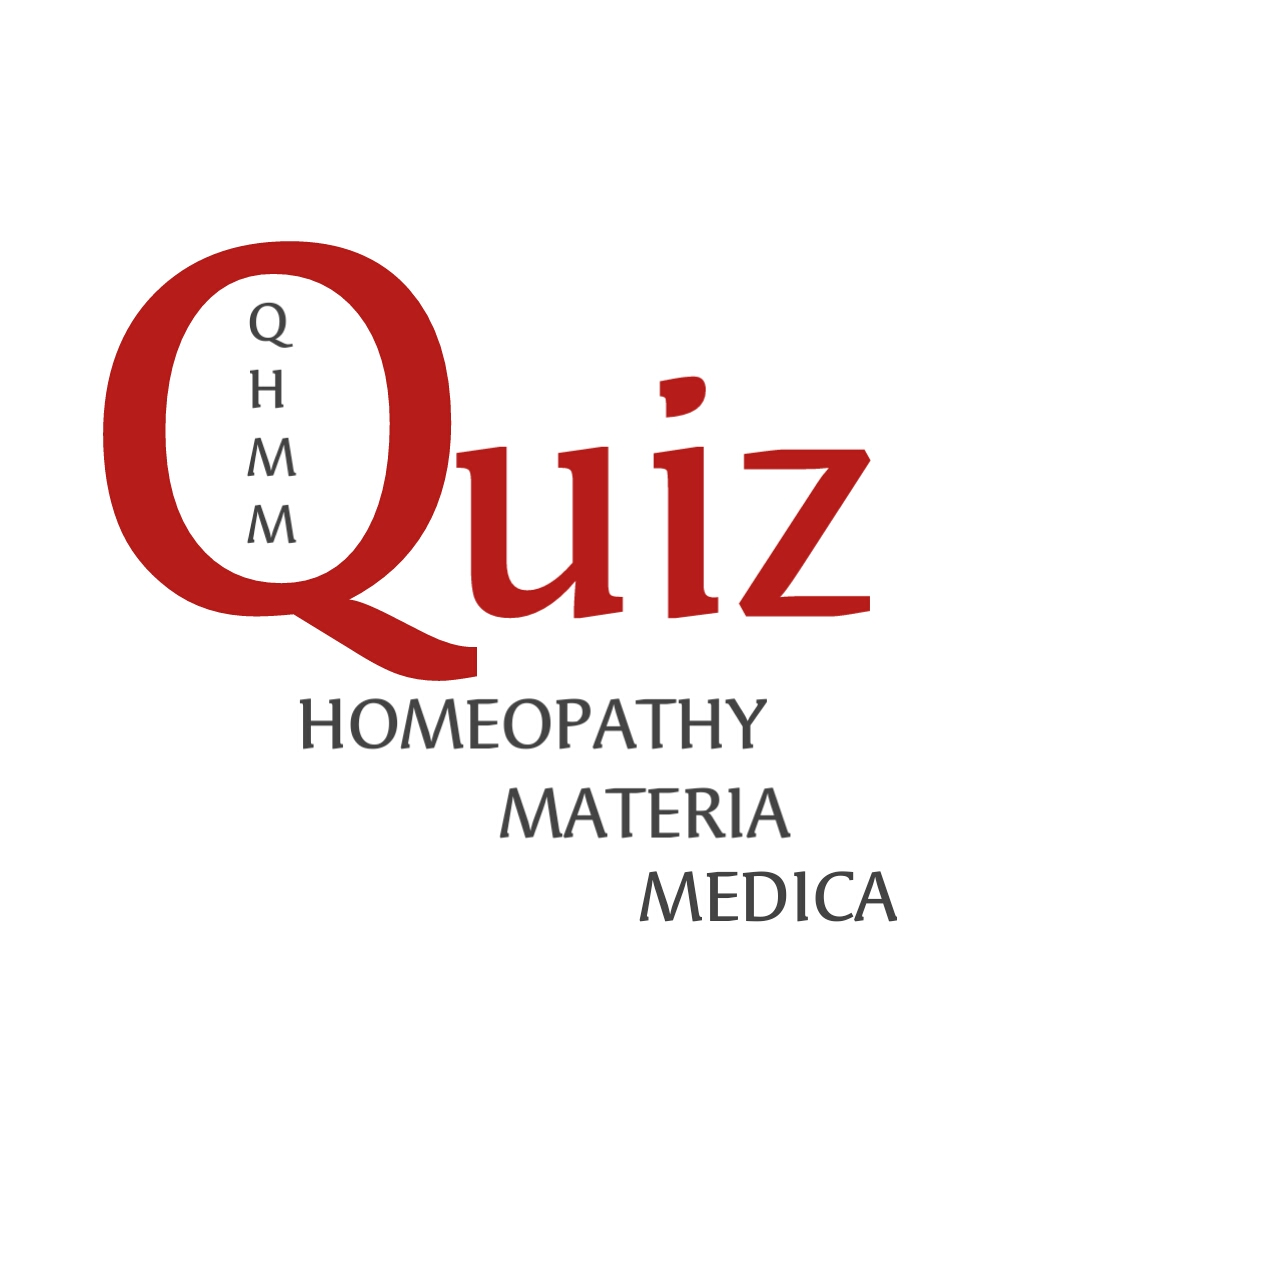 Homeopathy Materia Medica Quiz Homeopathy